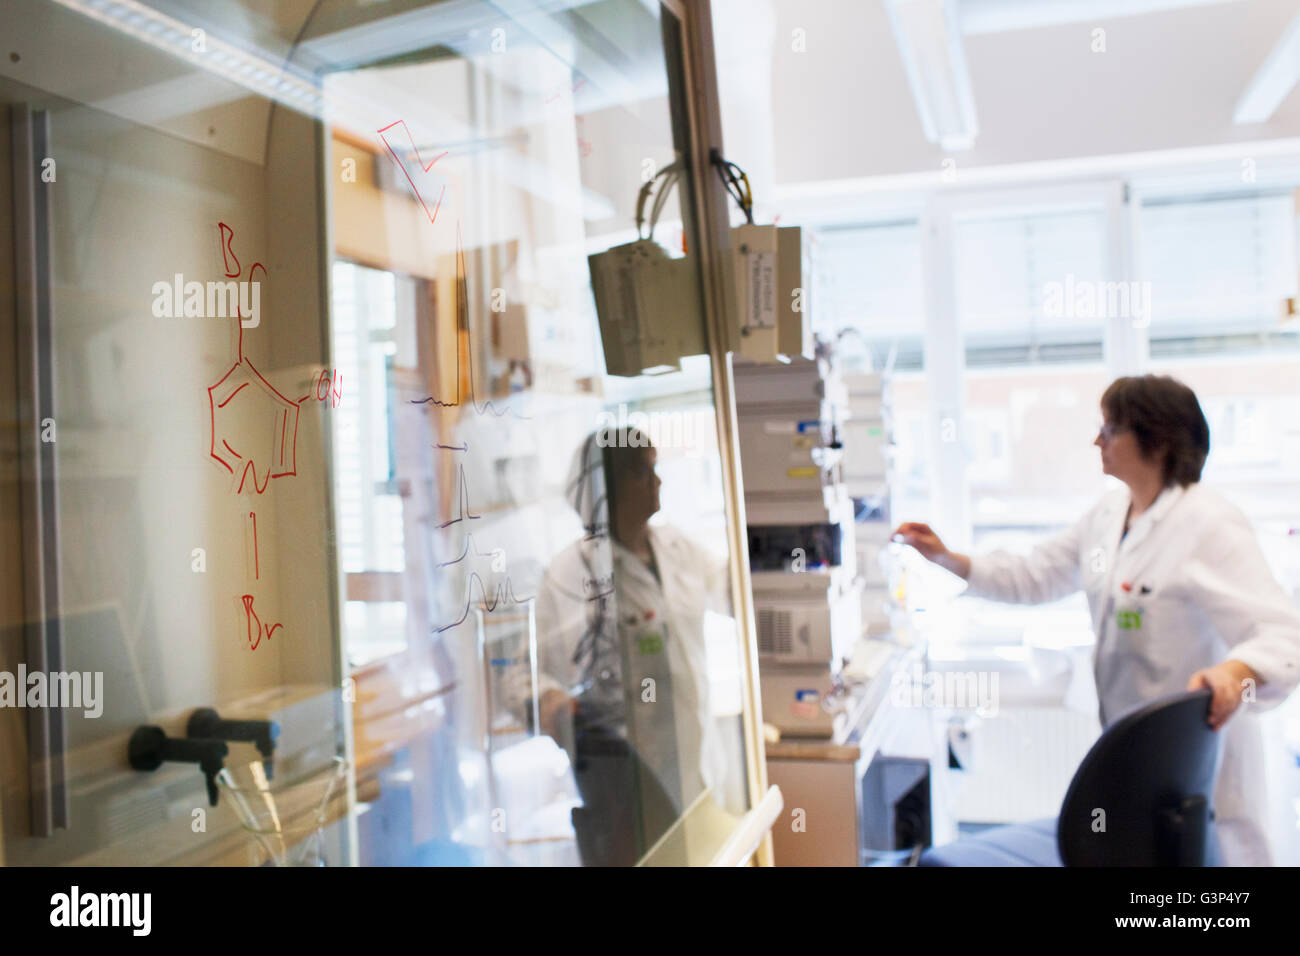 Sweden, Senior woman scientist working in lab - Stock Image